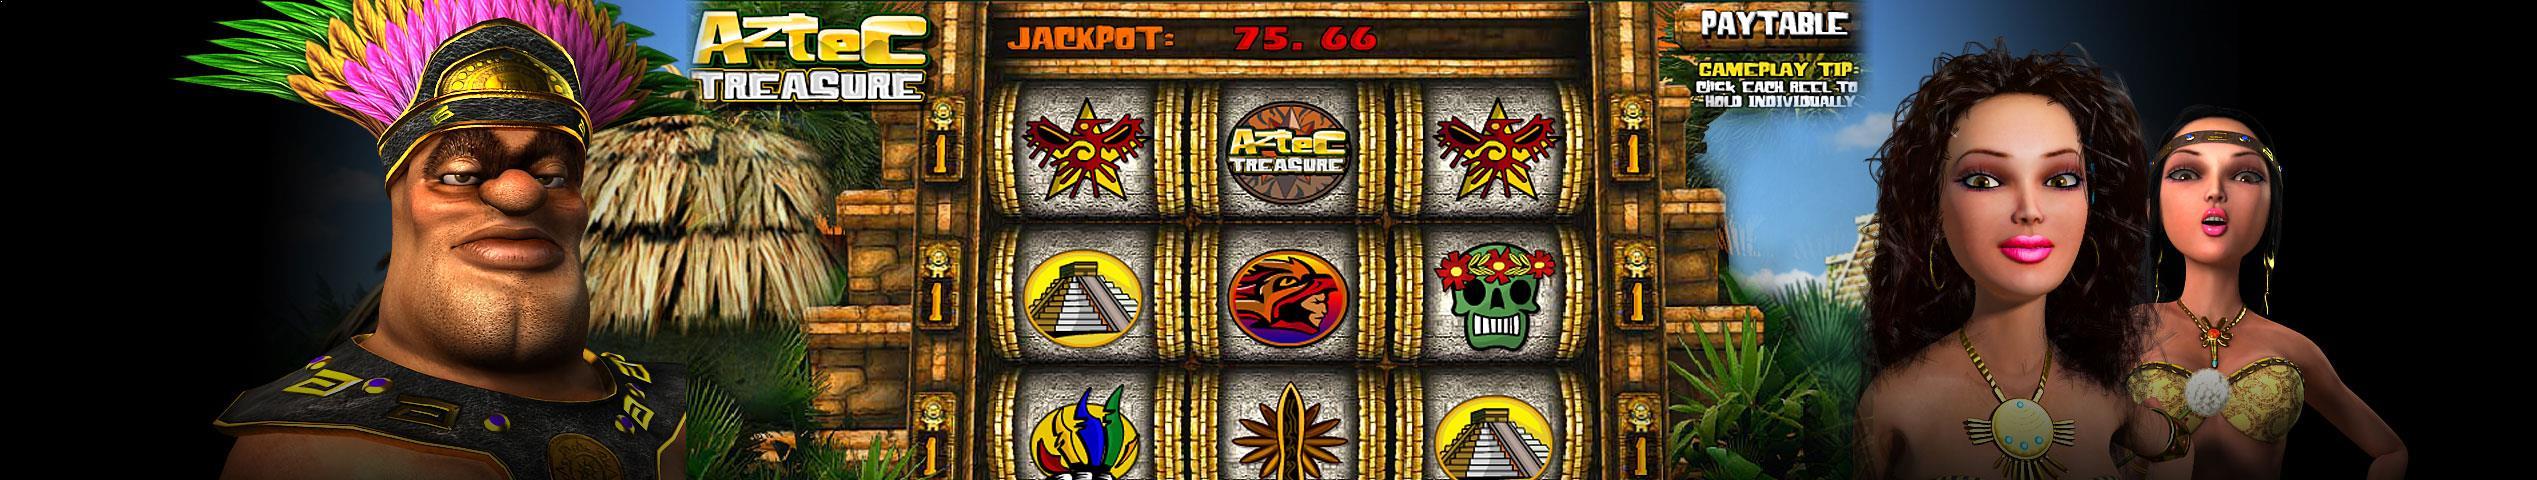 Aztec Treasure Multa Baft jocuri slot slider Betsoft